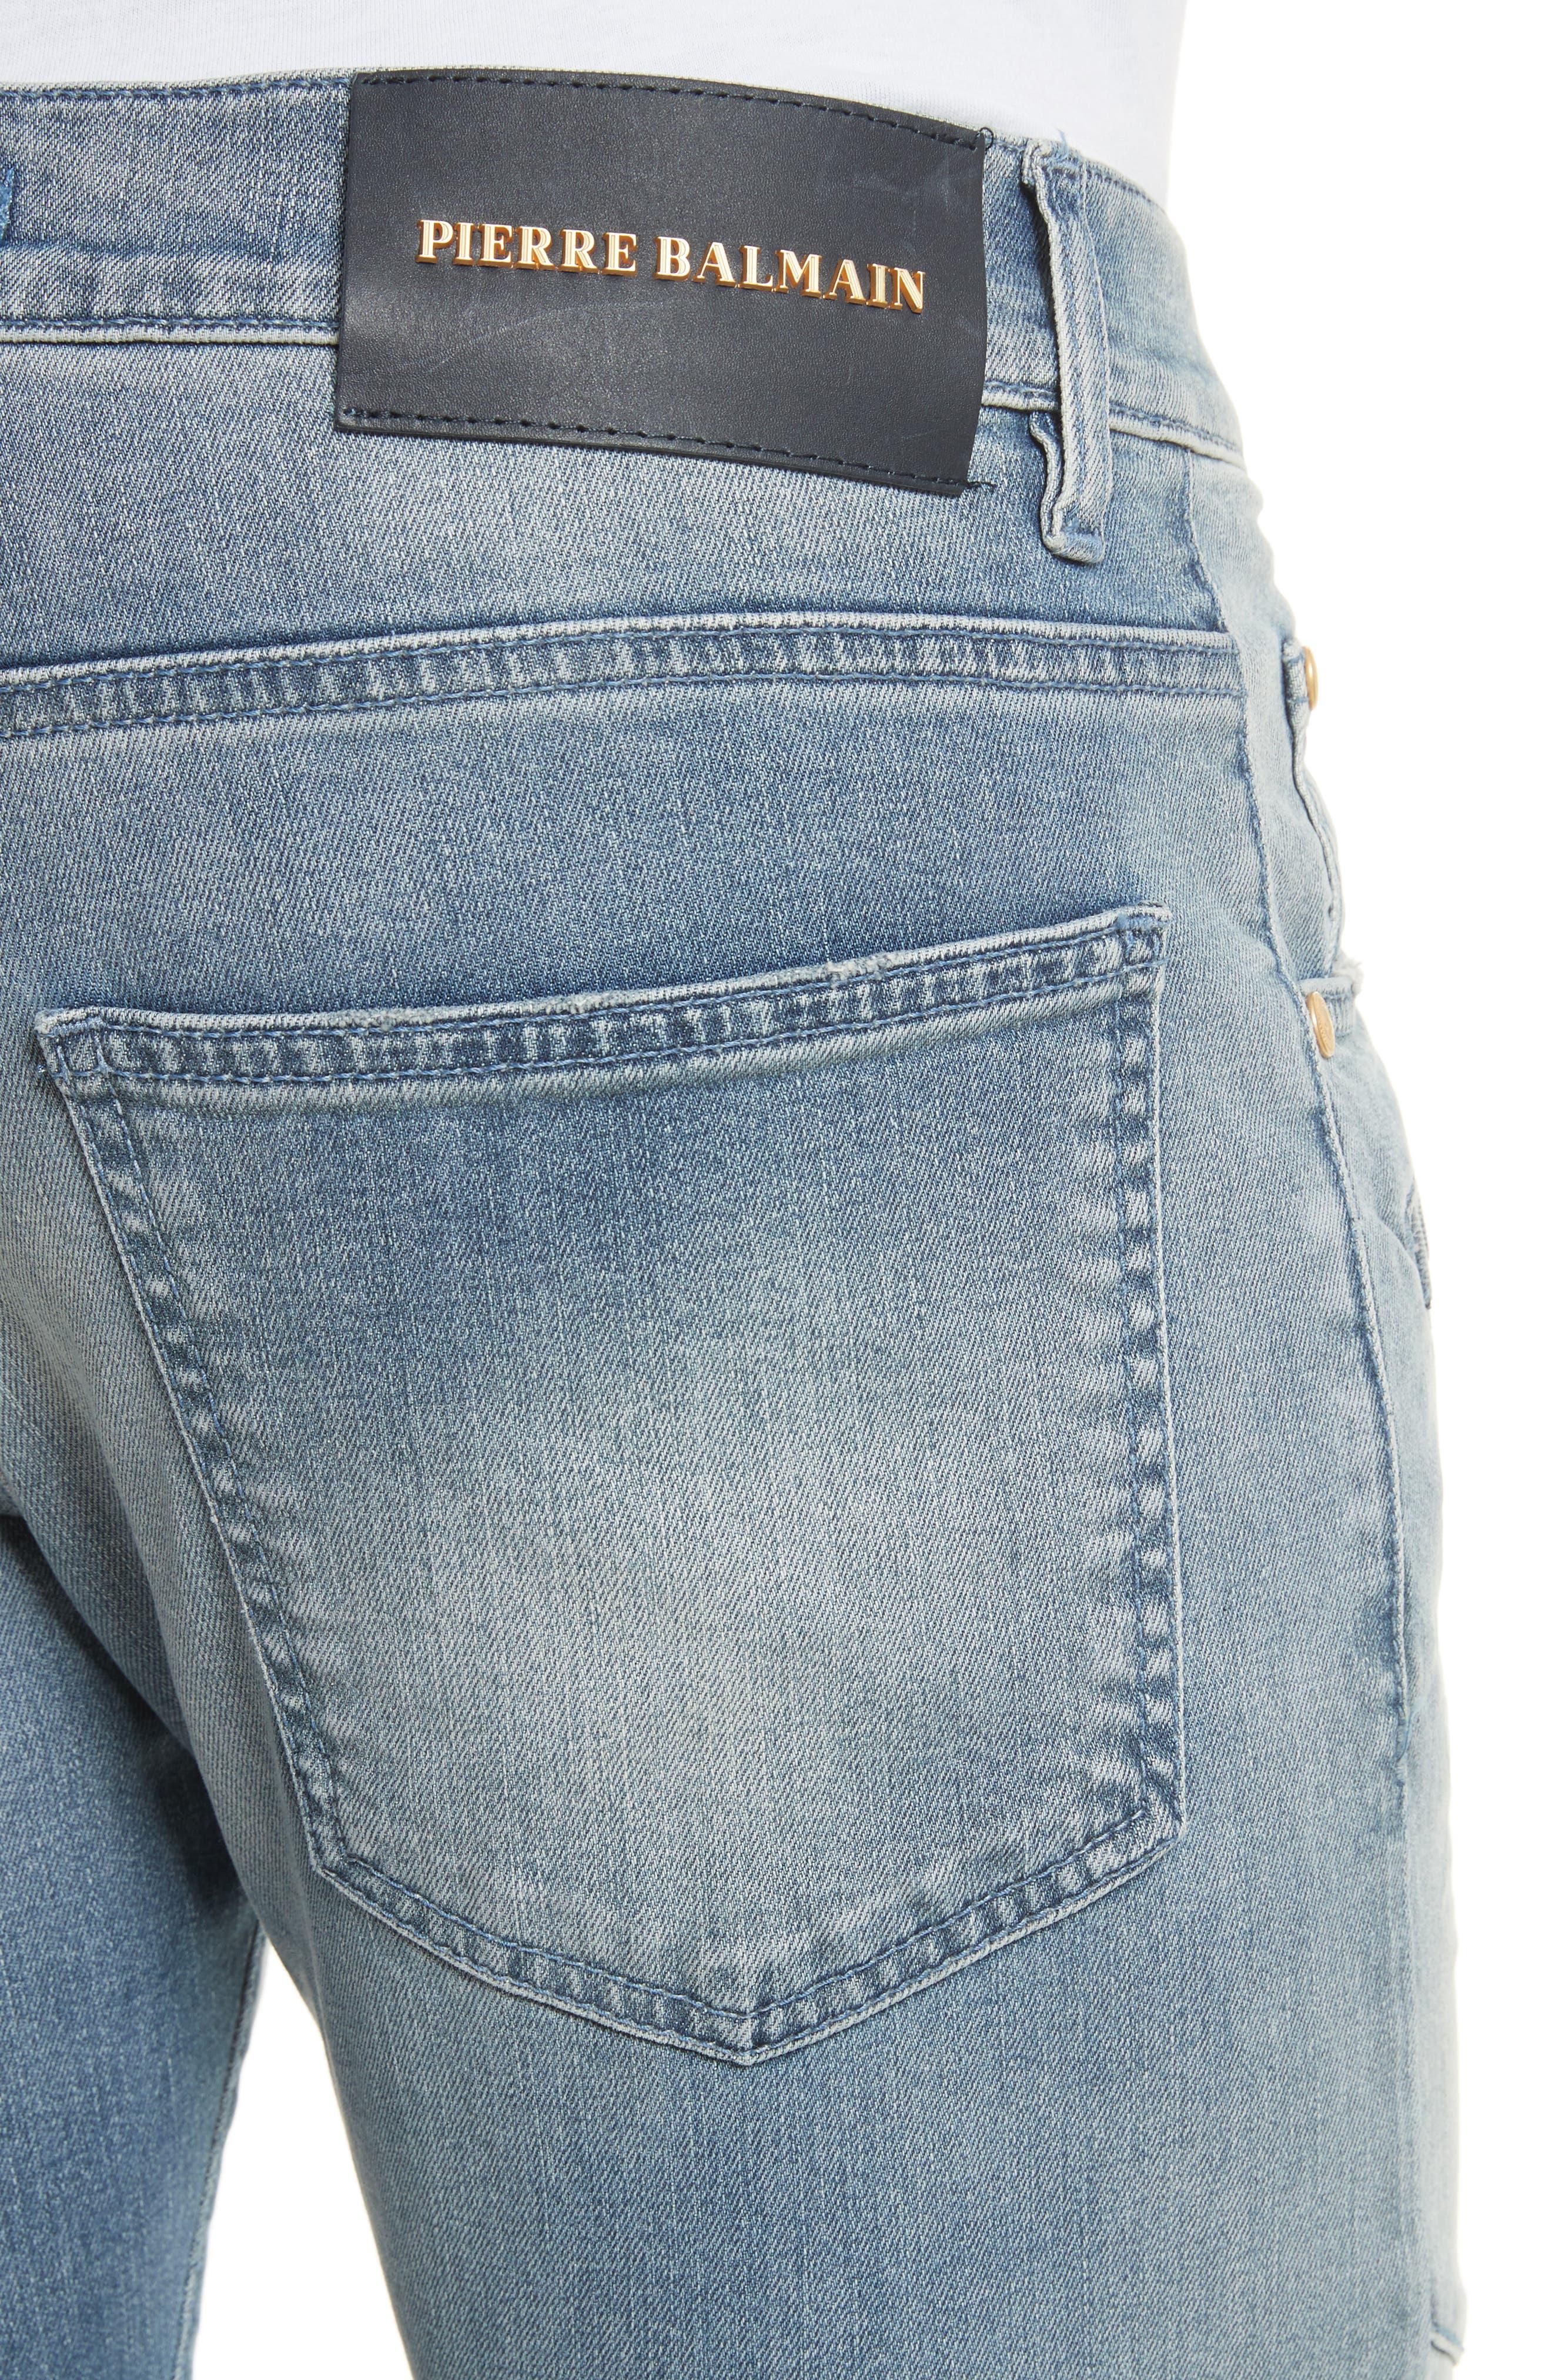 Slit Knee Jeans,                             Alternate thumbnail 4, color,                             420